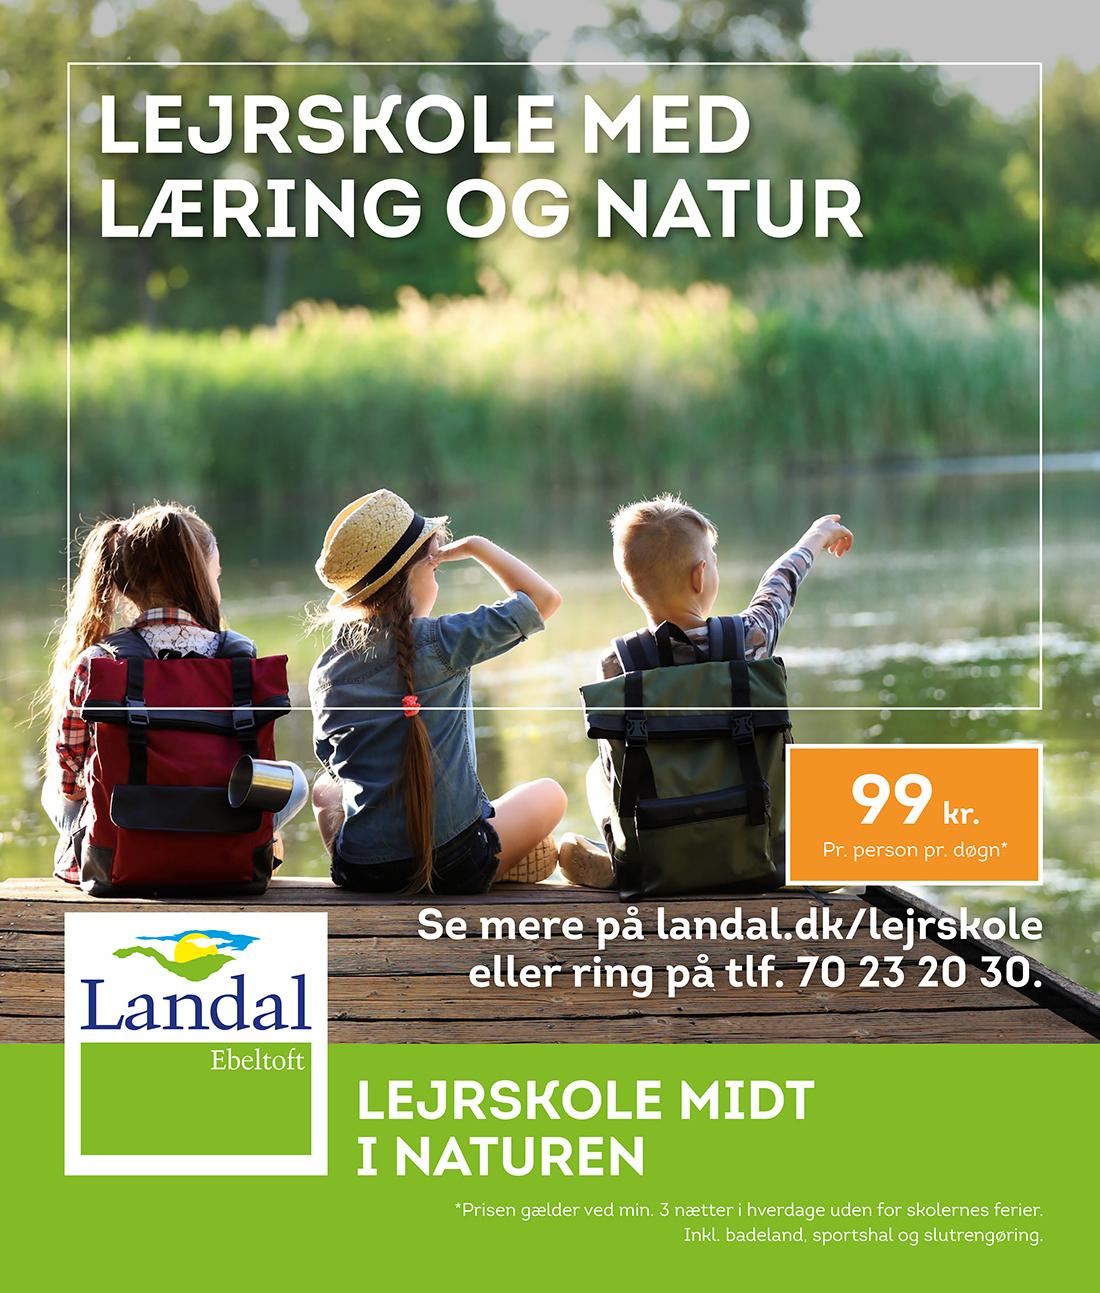 Landal-Ebeltoft-2020